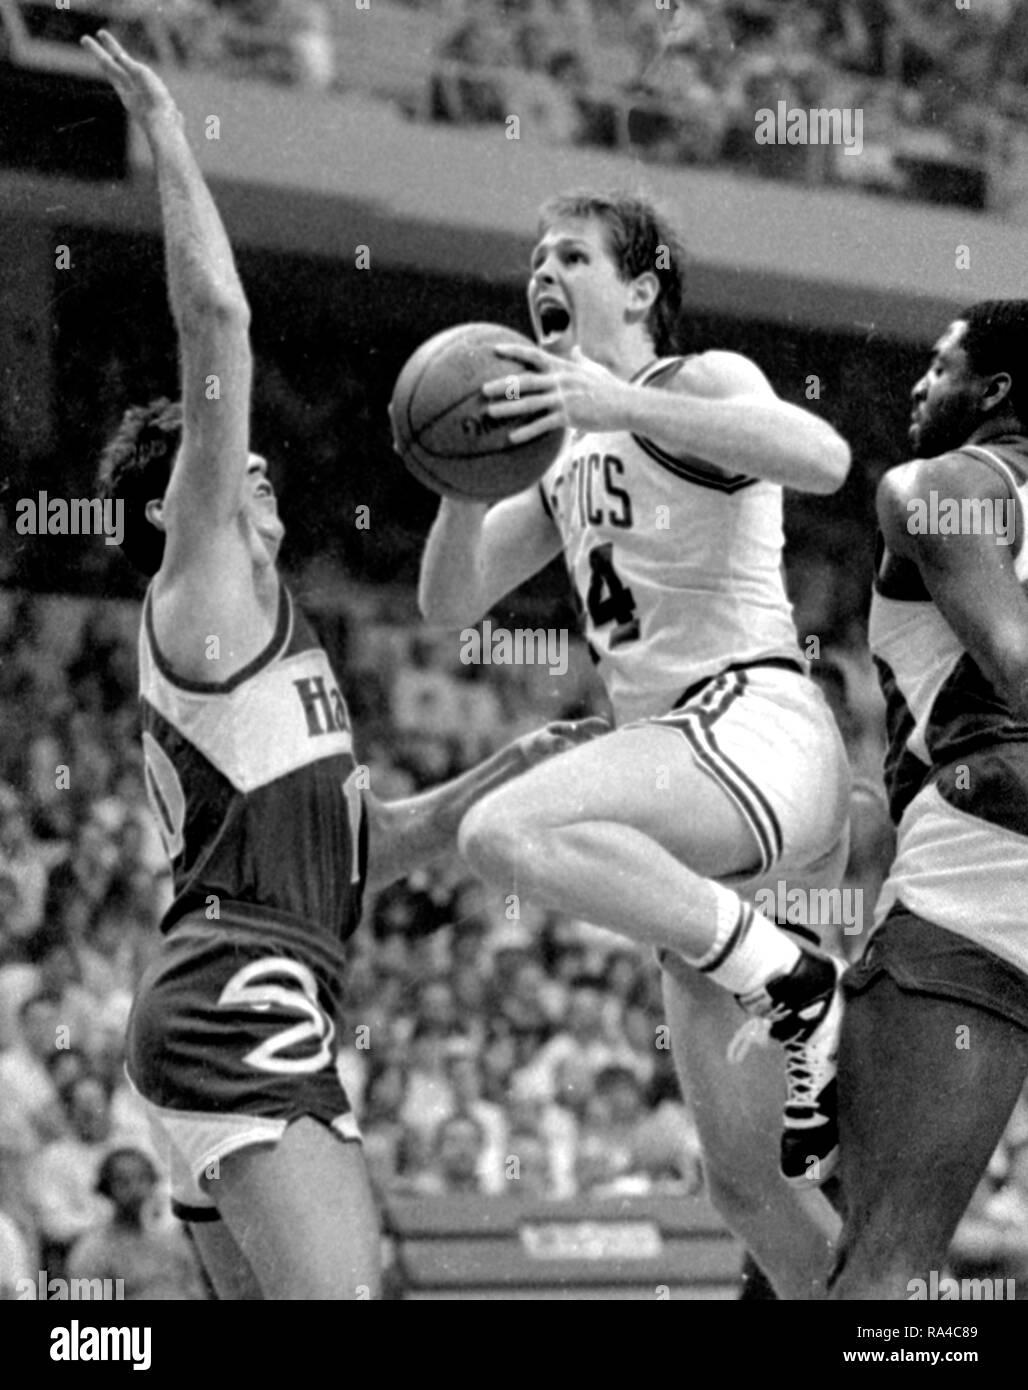 Boston Celtics Danny Ainge scores past Atlanta Hawks in game action at the Boston Garden in the 1986 season Photo by Bill Belknap - Stock Image